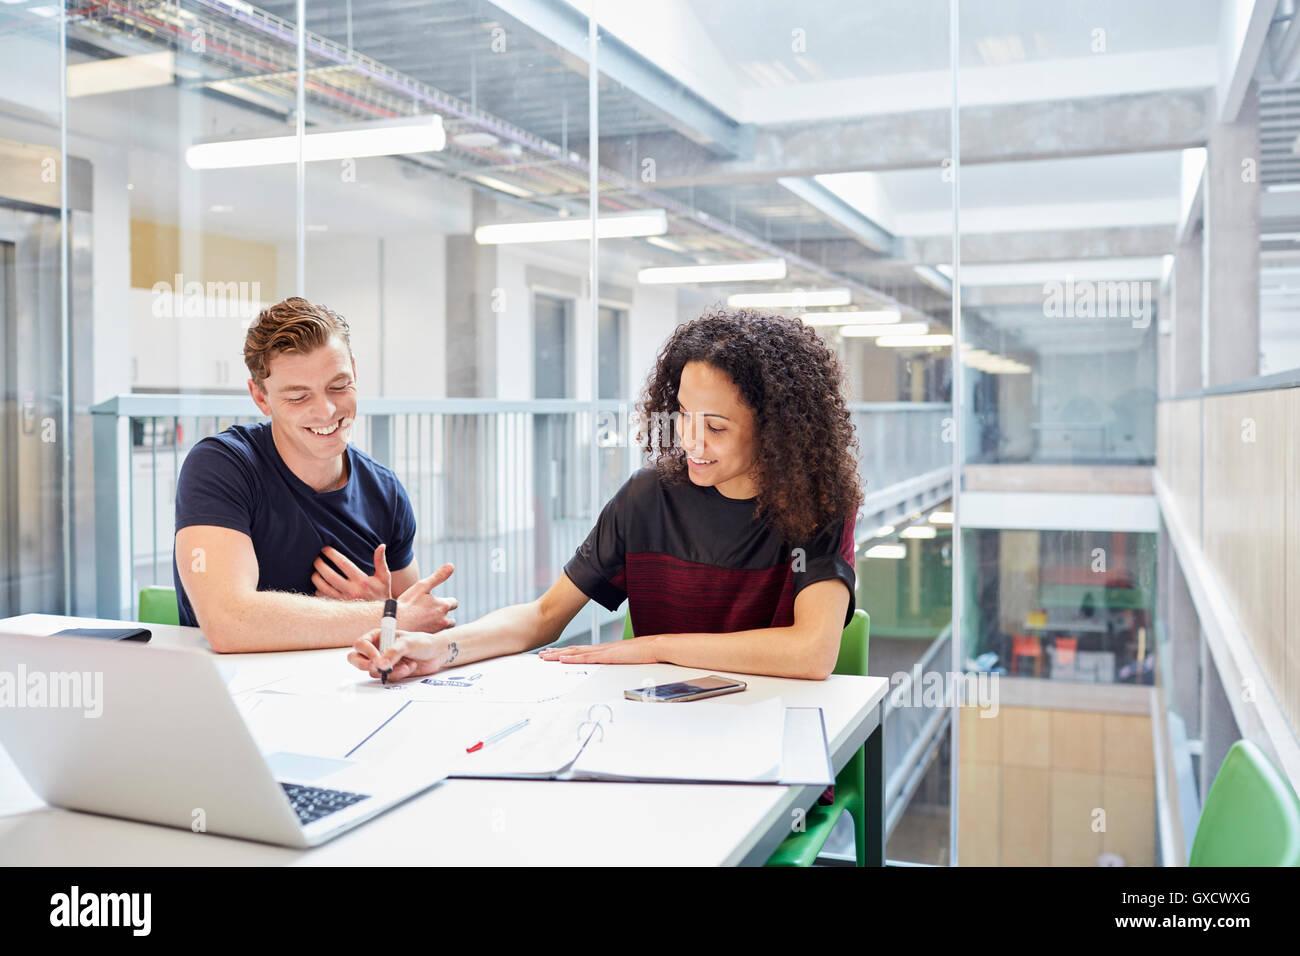 Male and female designers brainstorming in design studio - Stock Image